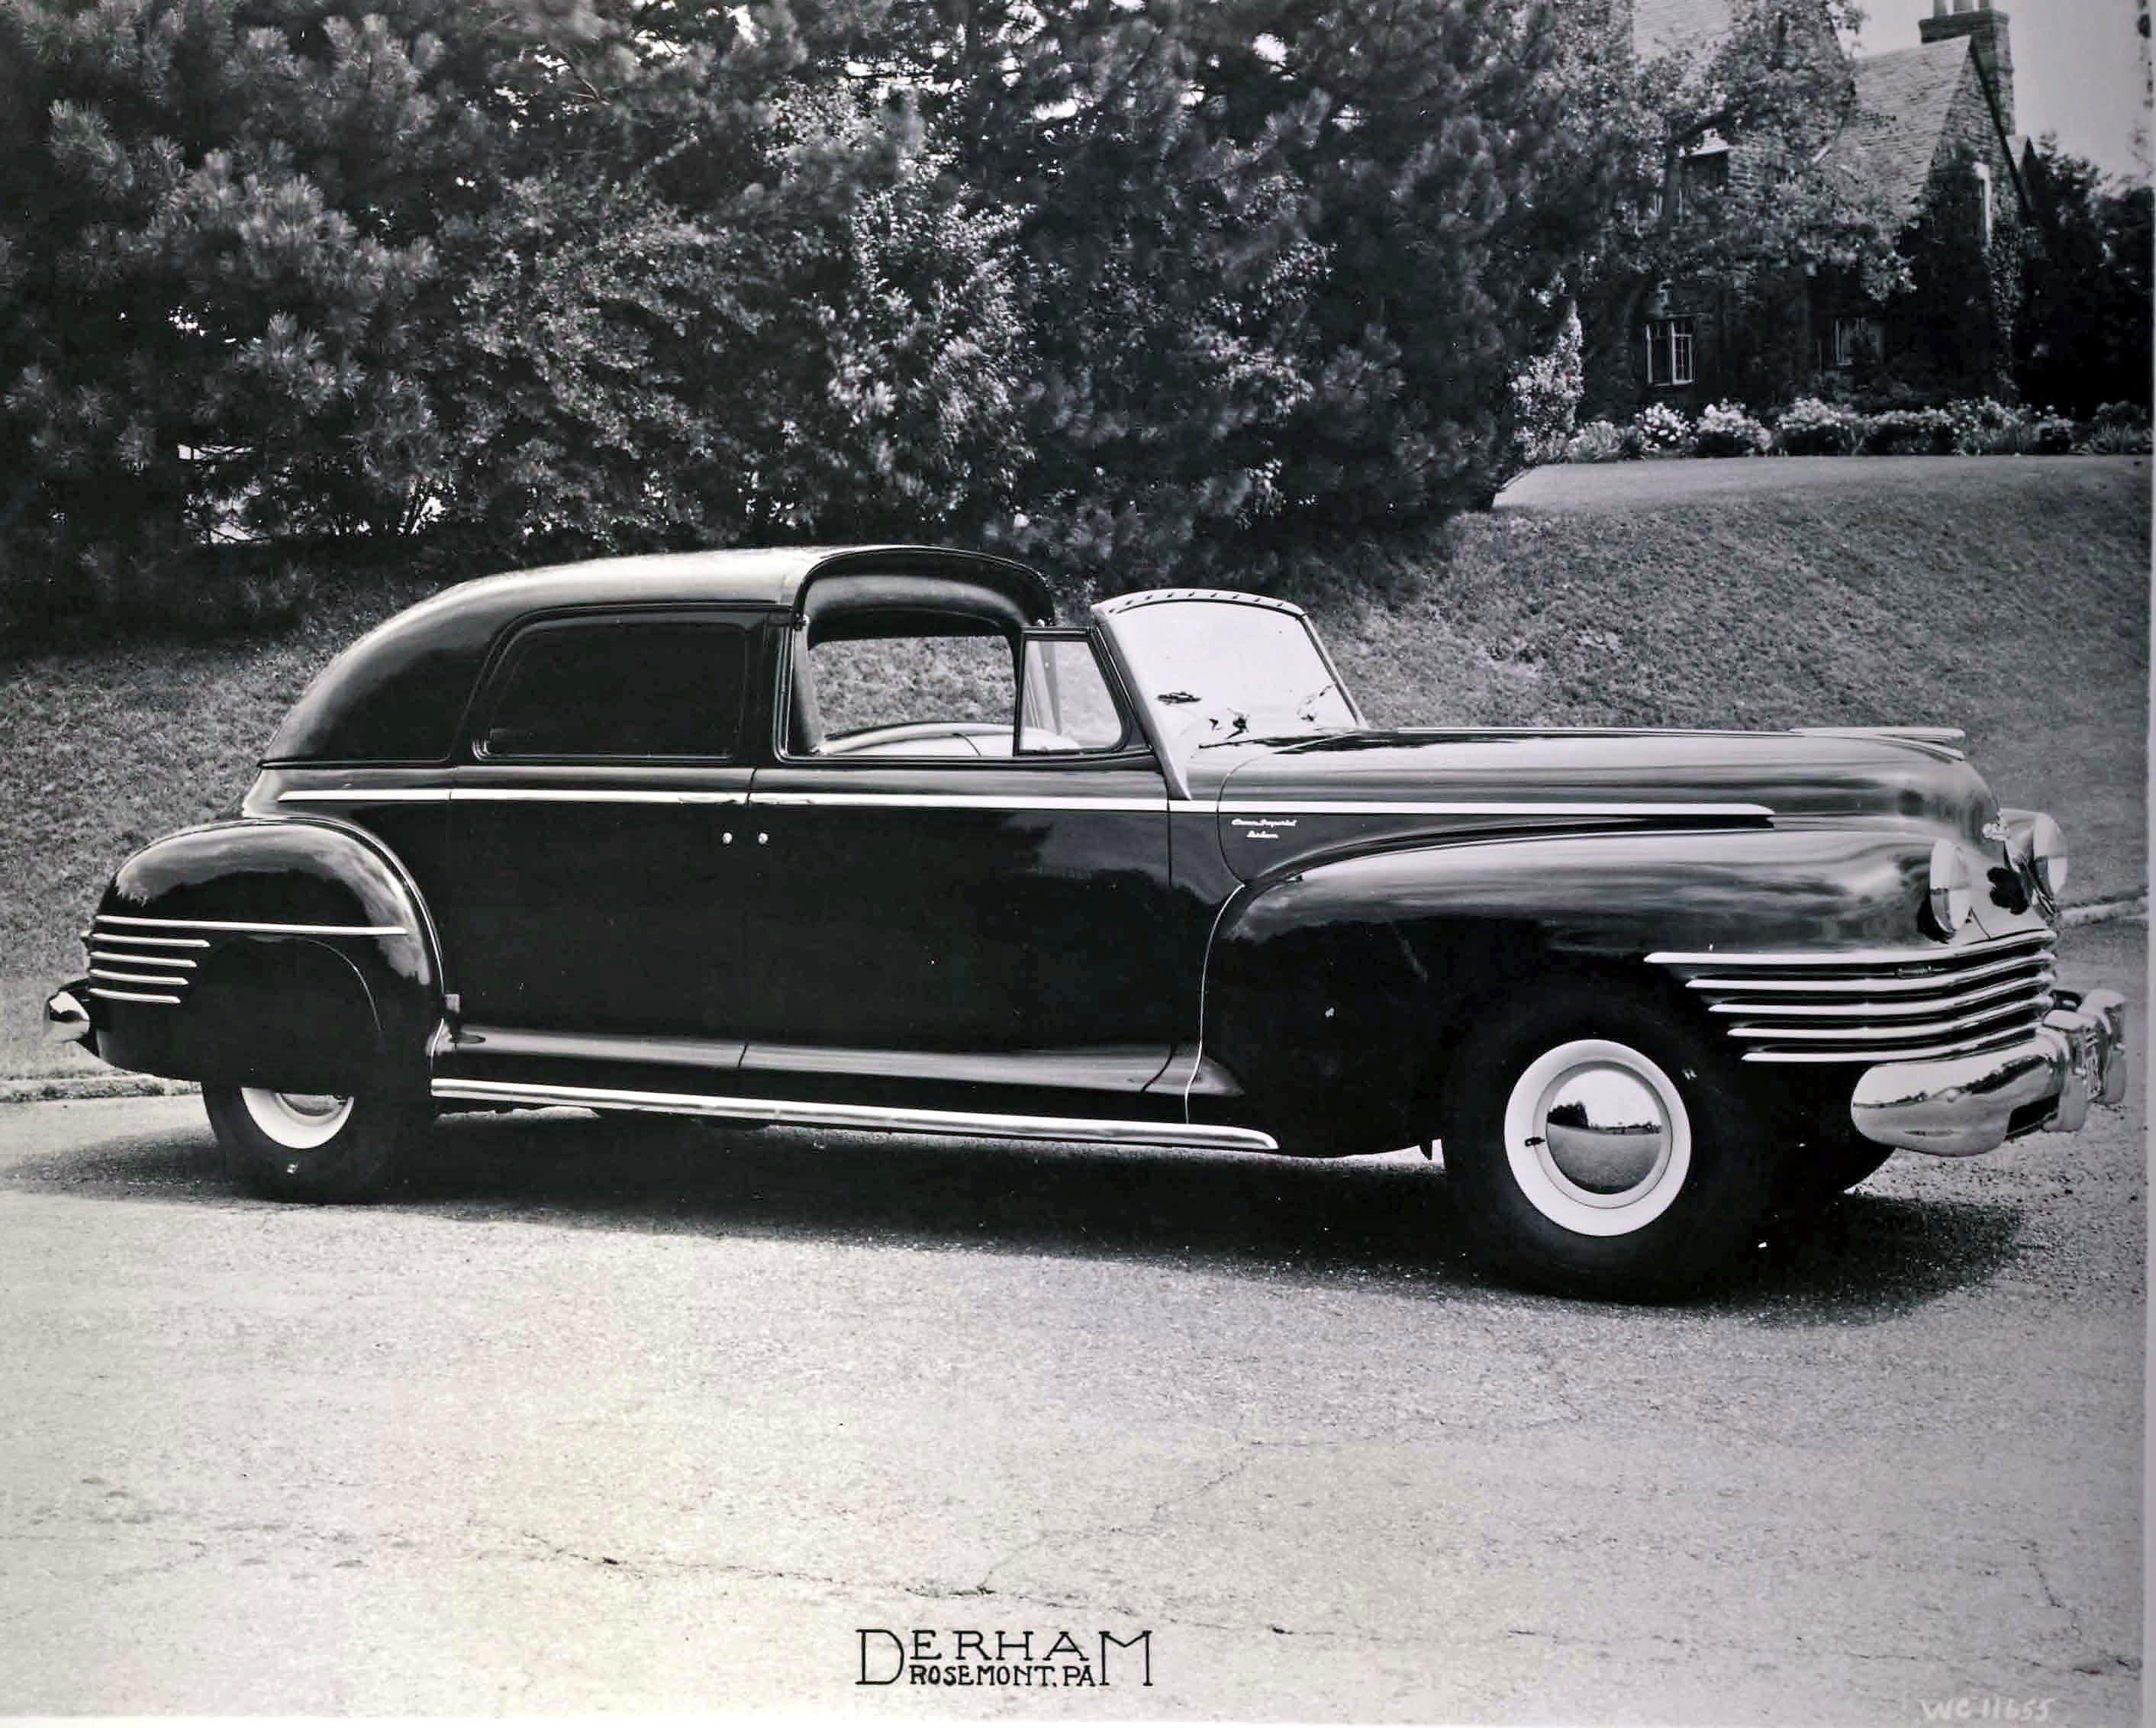 Hershey Car Show >> Vanderbilt Cup Races - Blog - My Hershey Treasure: Five ...